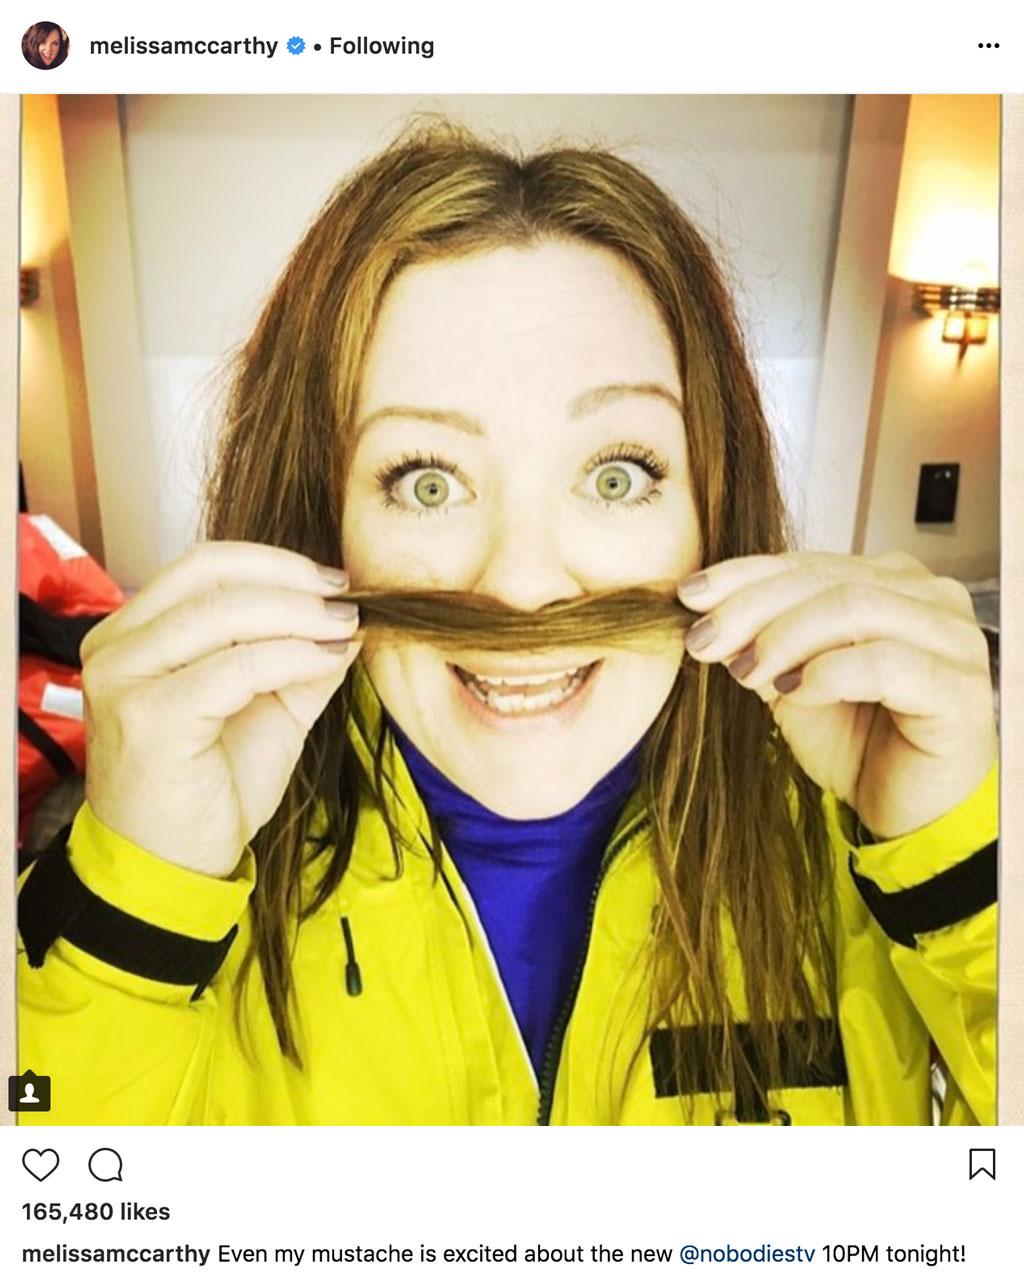 Melissa mccarthy chill relax instagram